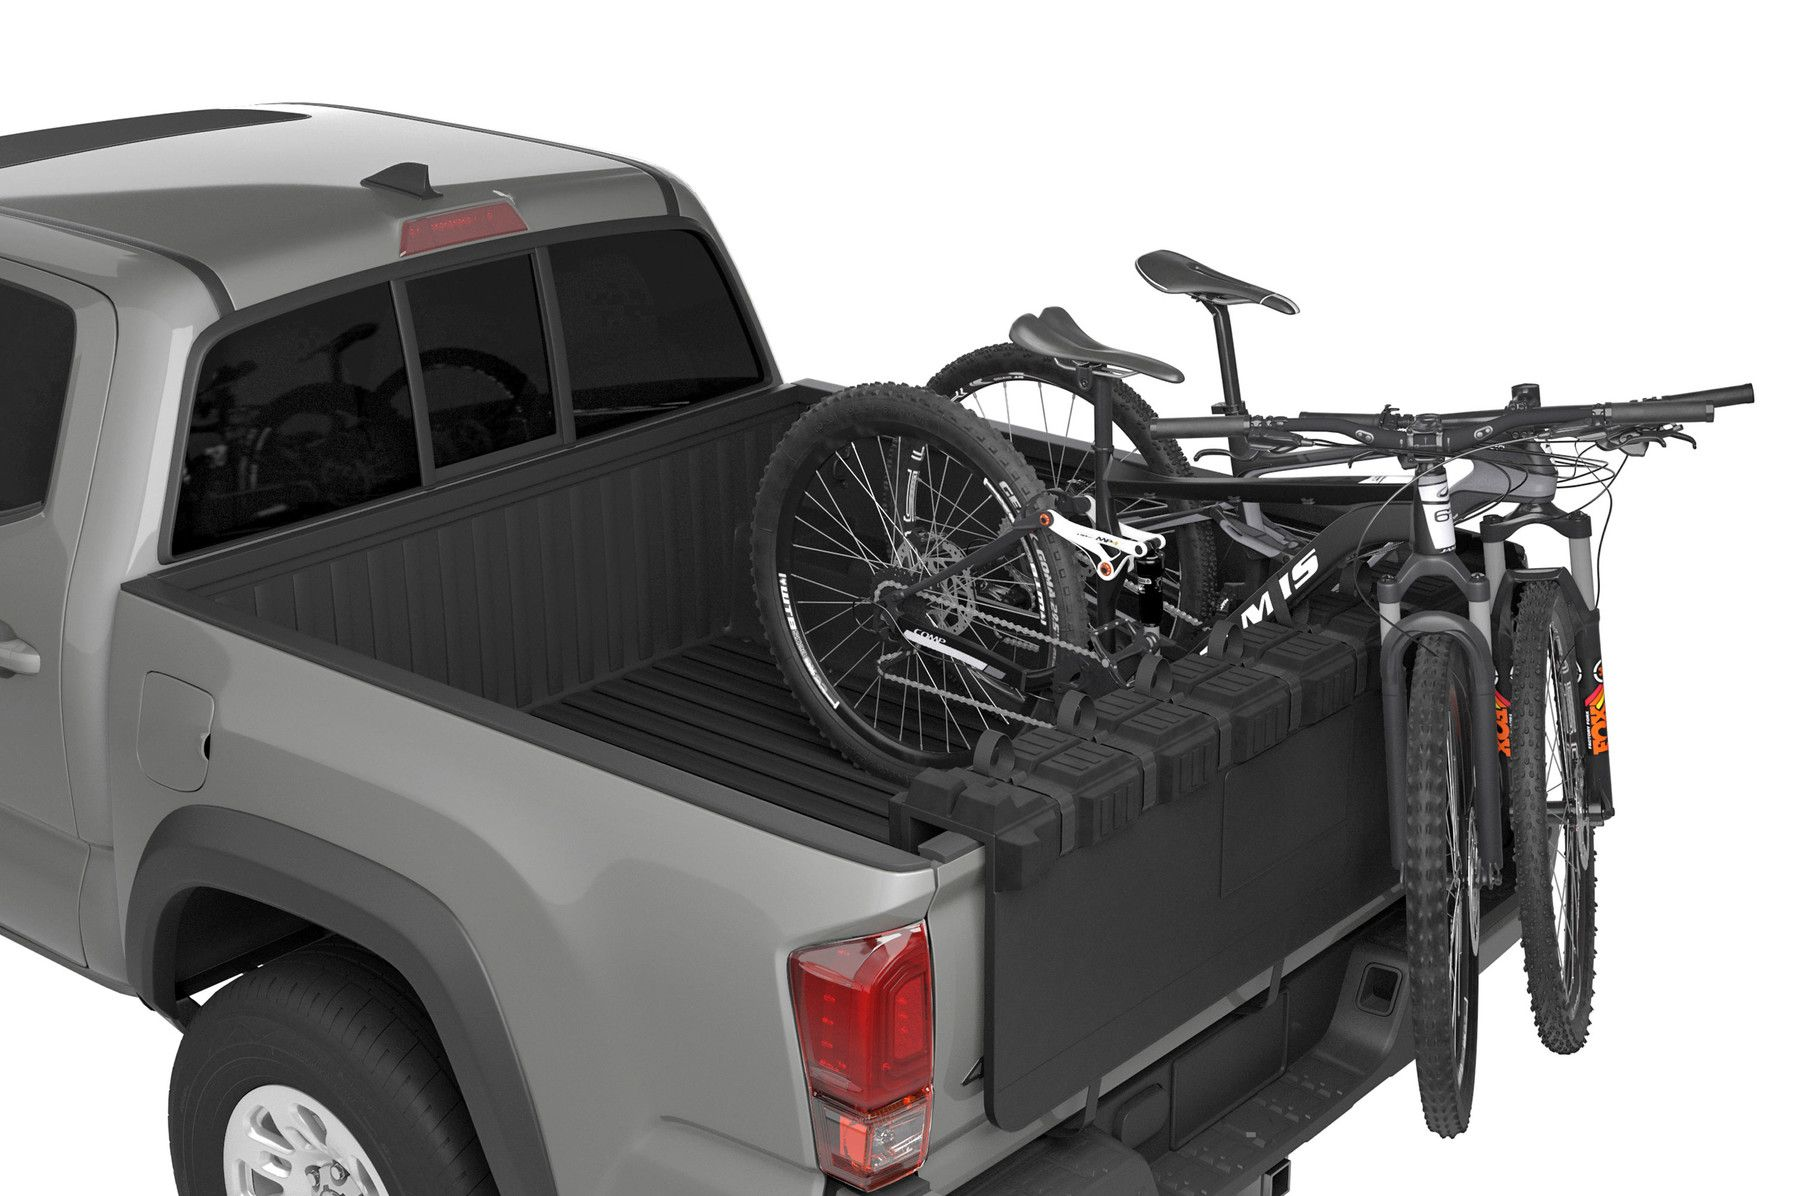 Thule Gatemate Pro Bike Rack Truck Bed Truck Bike Rack